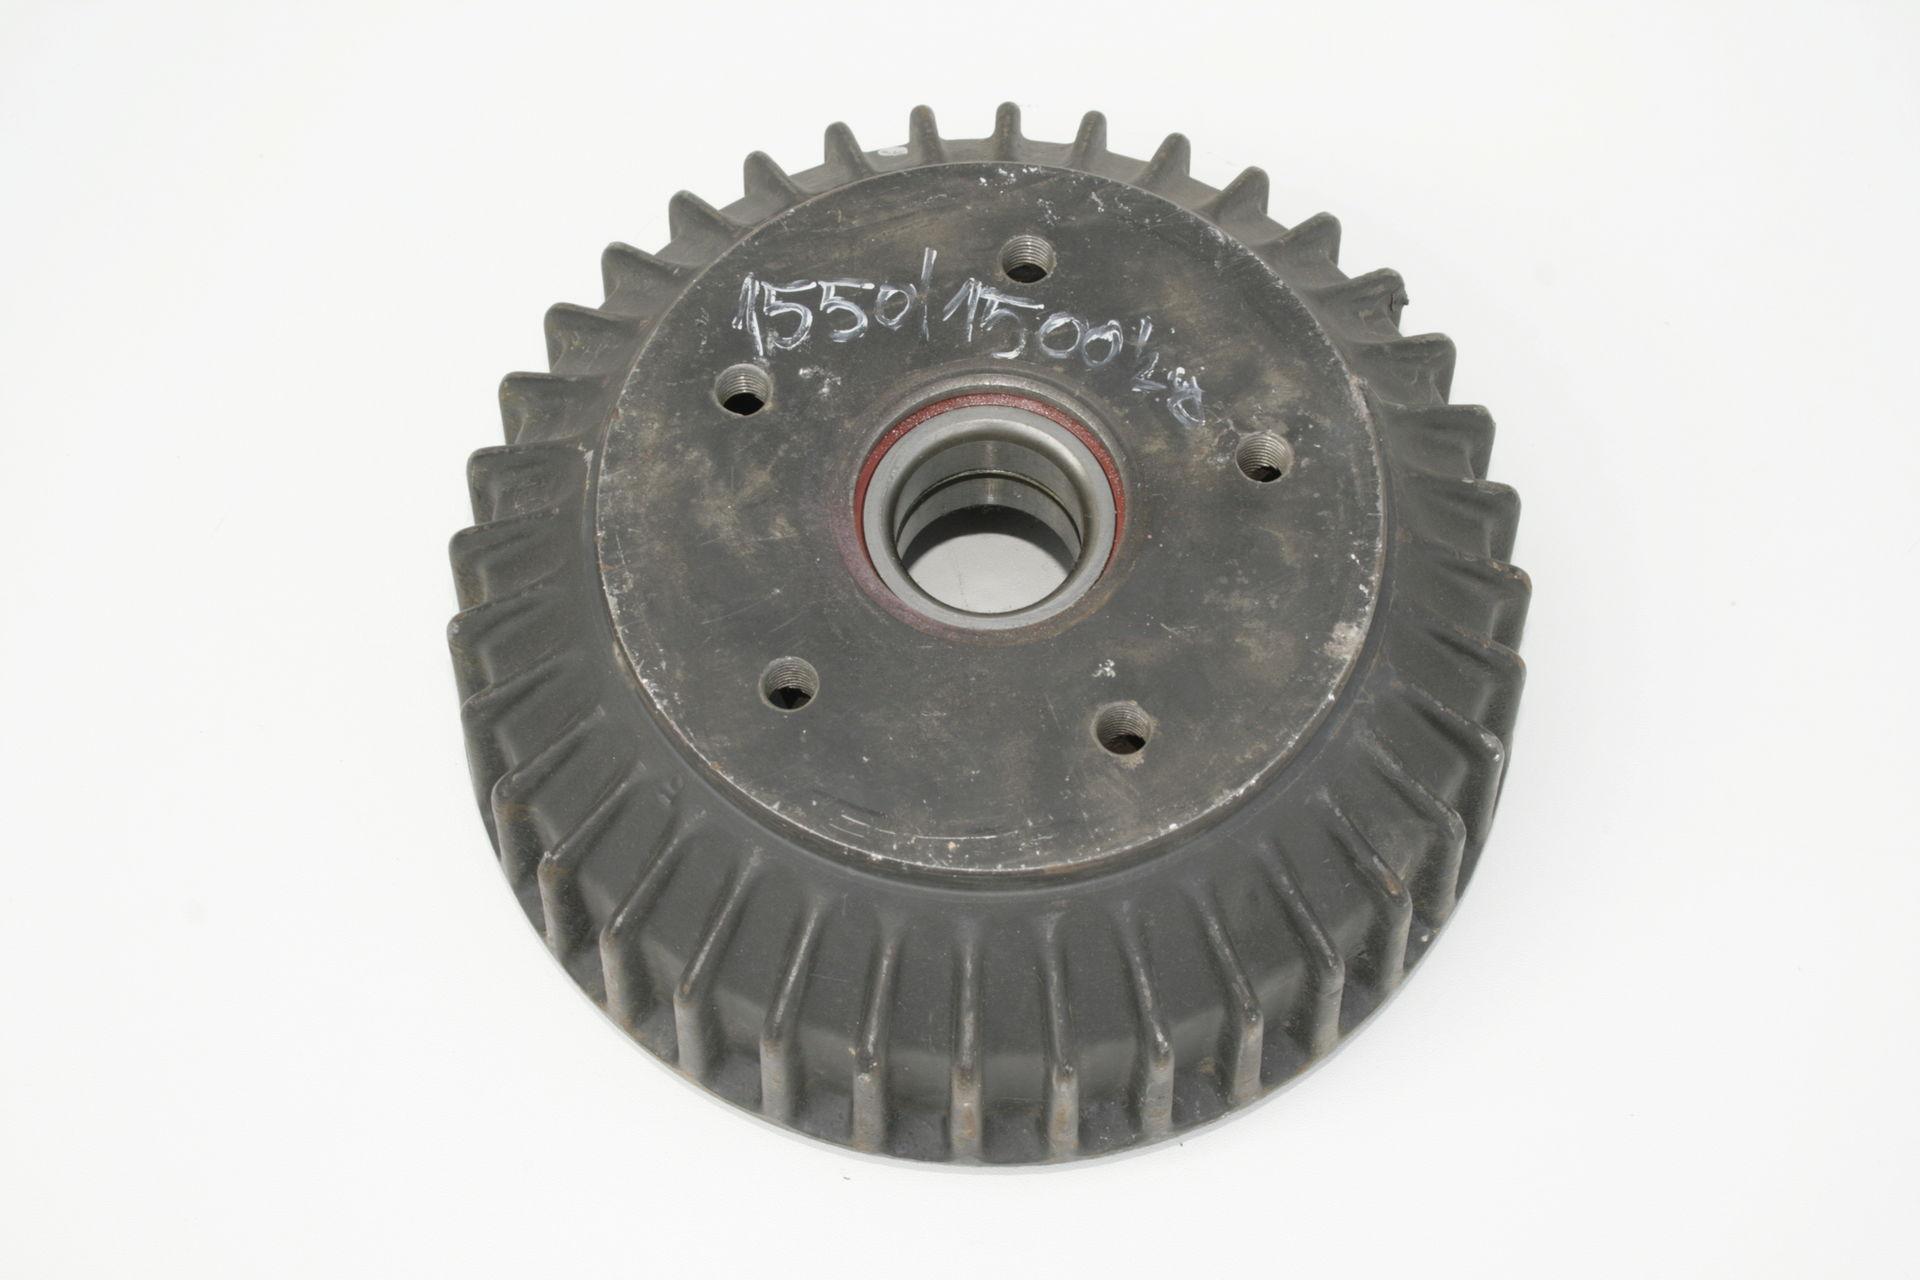 Brzdový buben AL-KO pr. 200 mm (1500 kg)